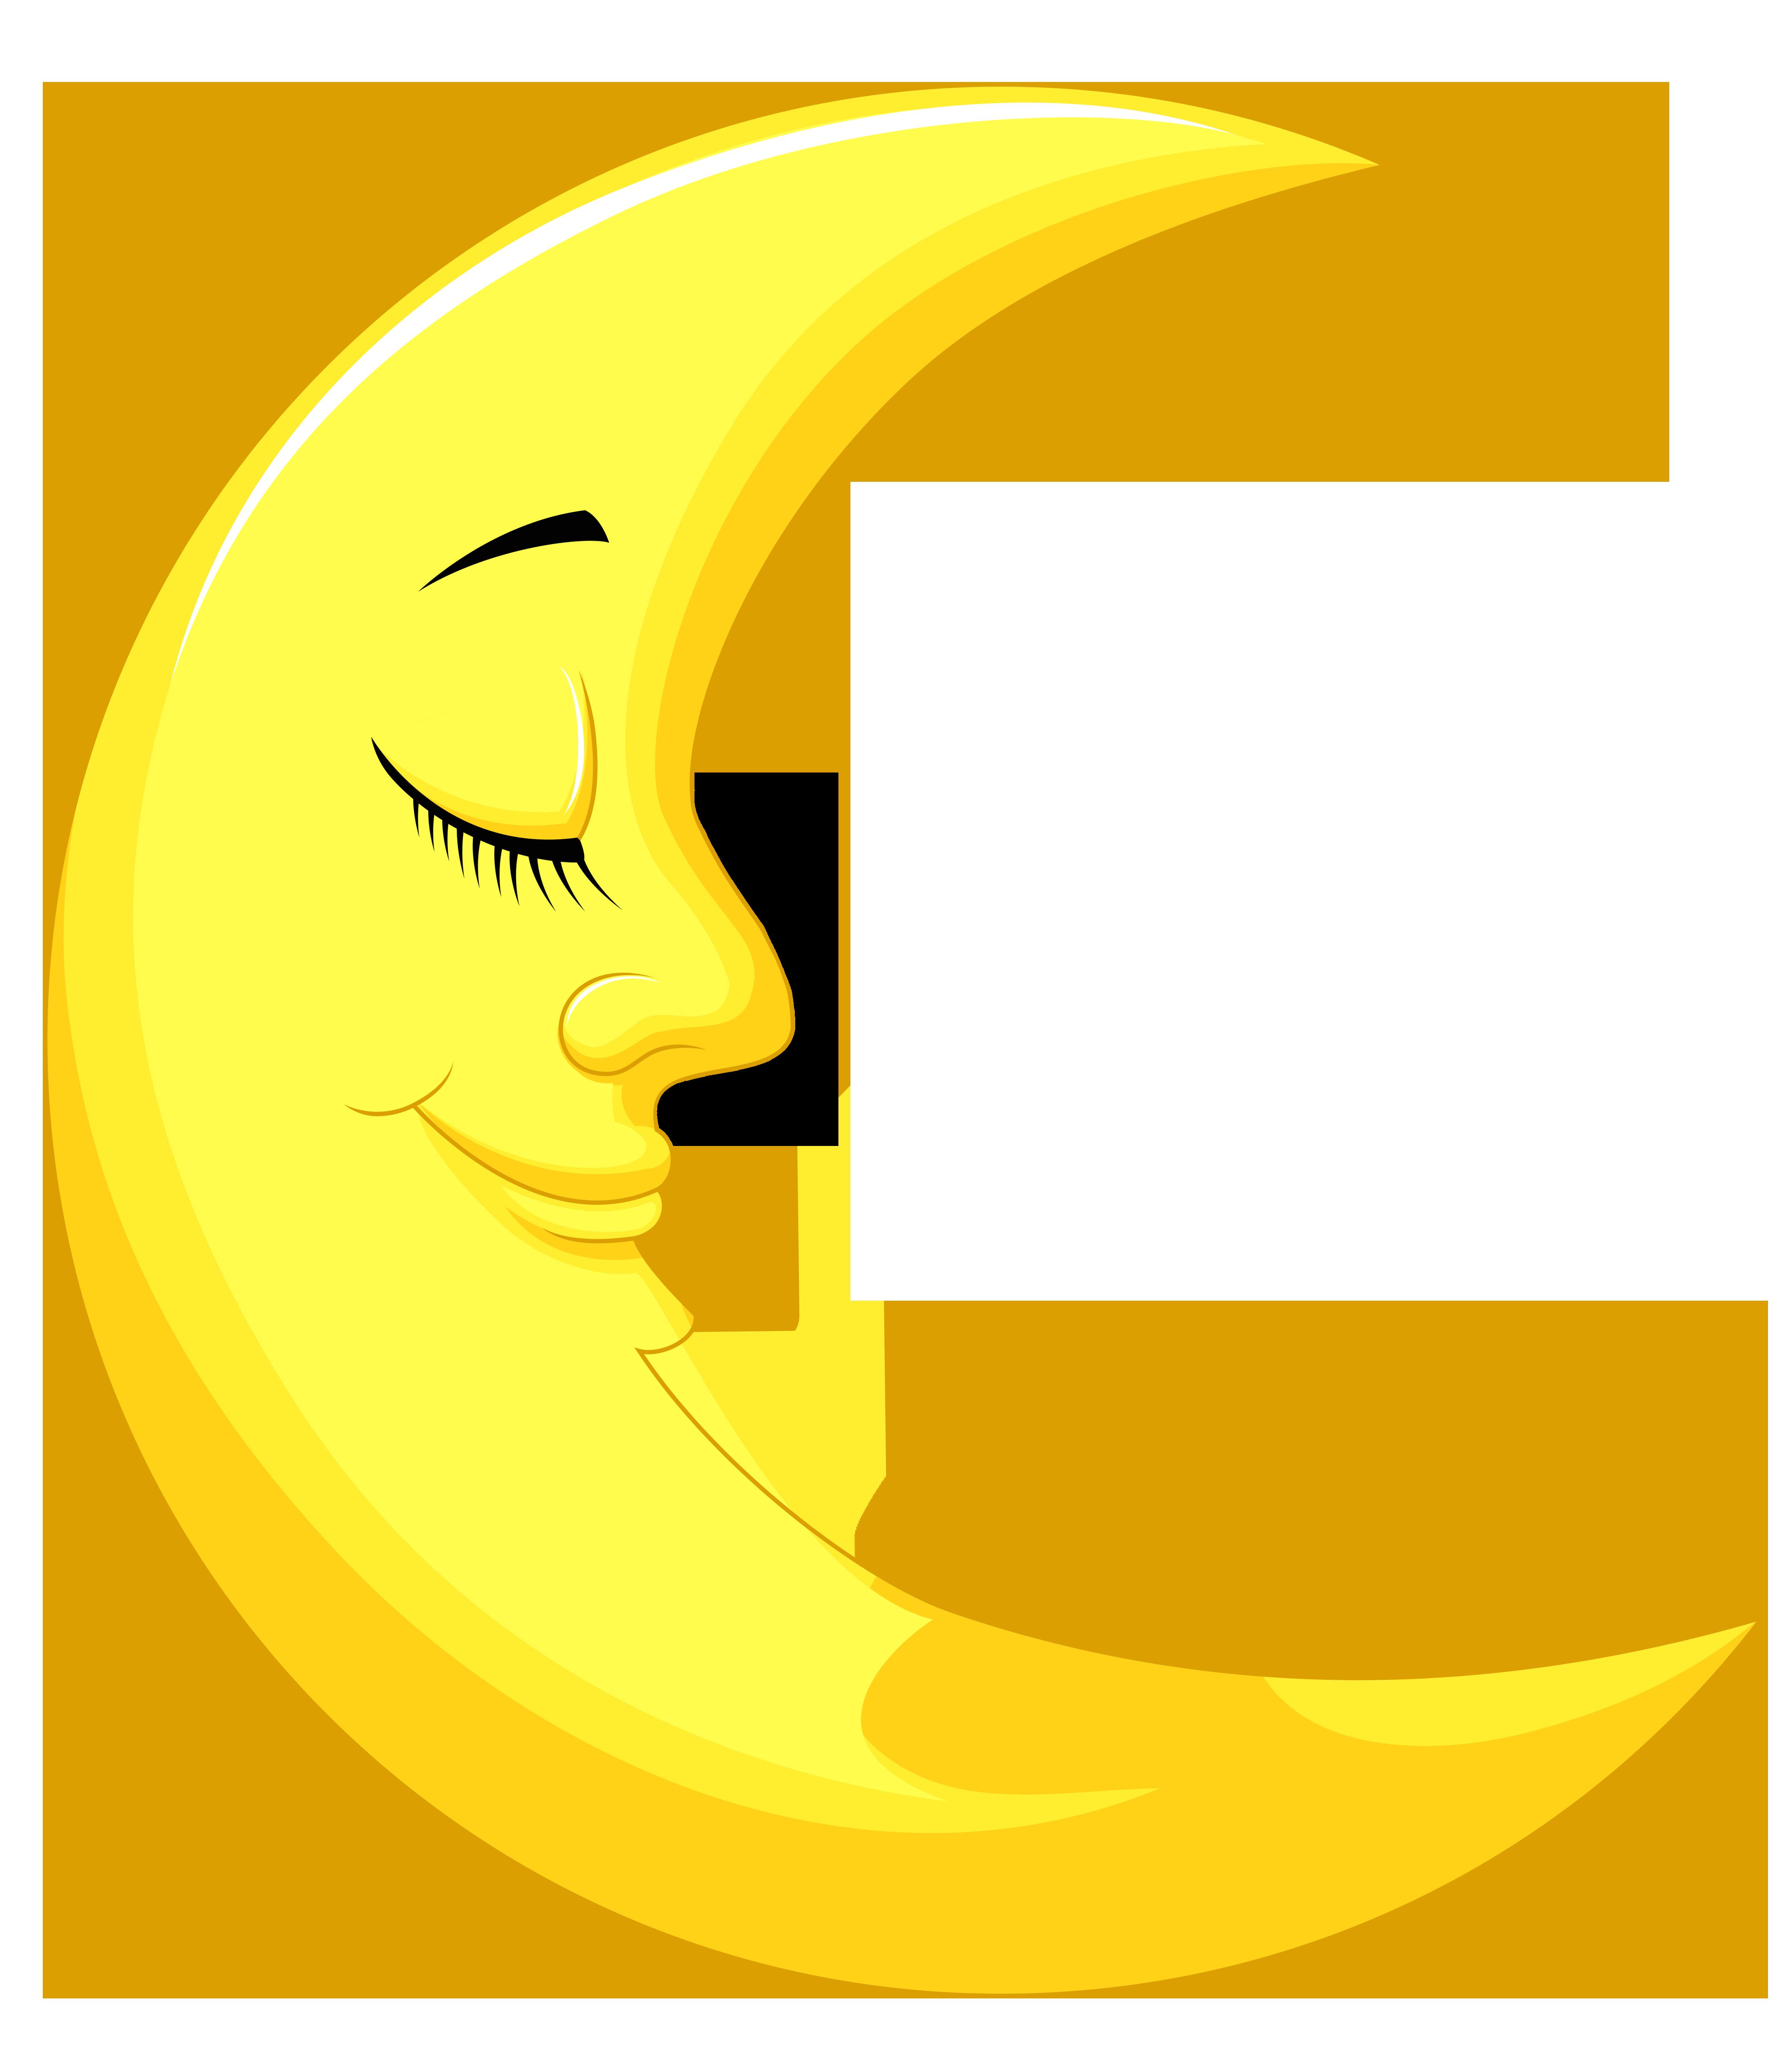 Moon Clipart Moon Clipart-Moon Clipart Moon Clipart-16